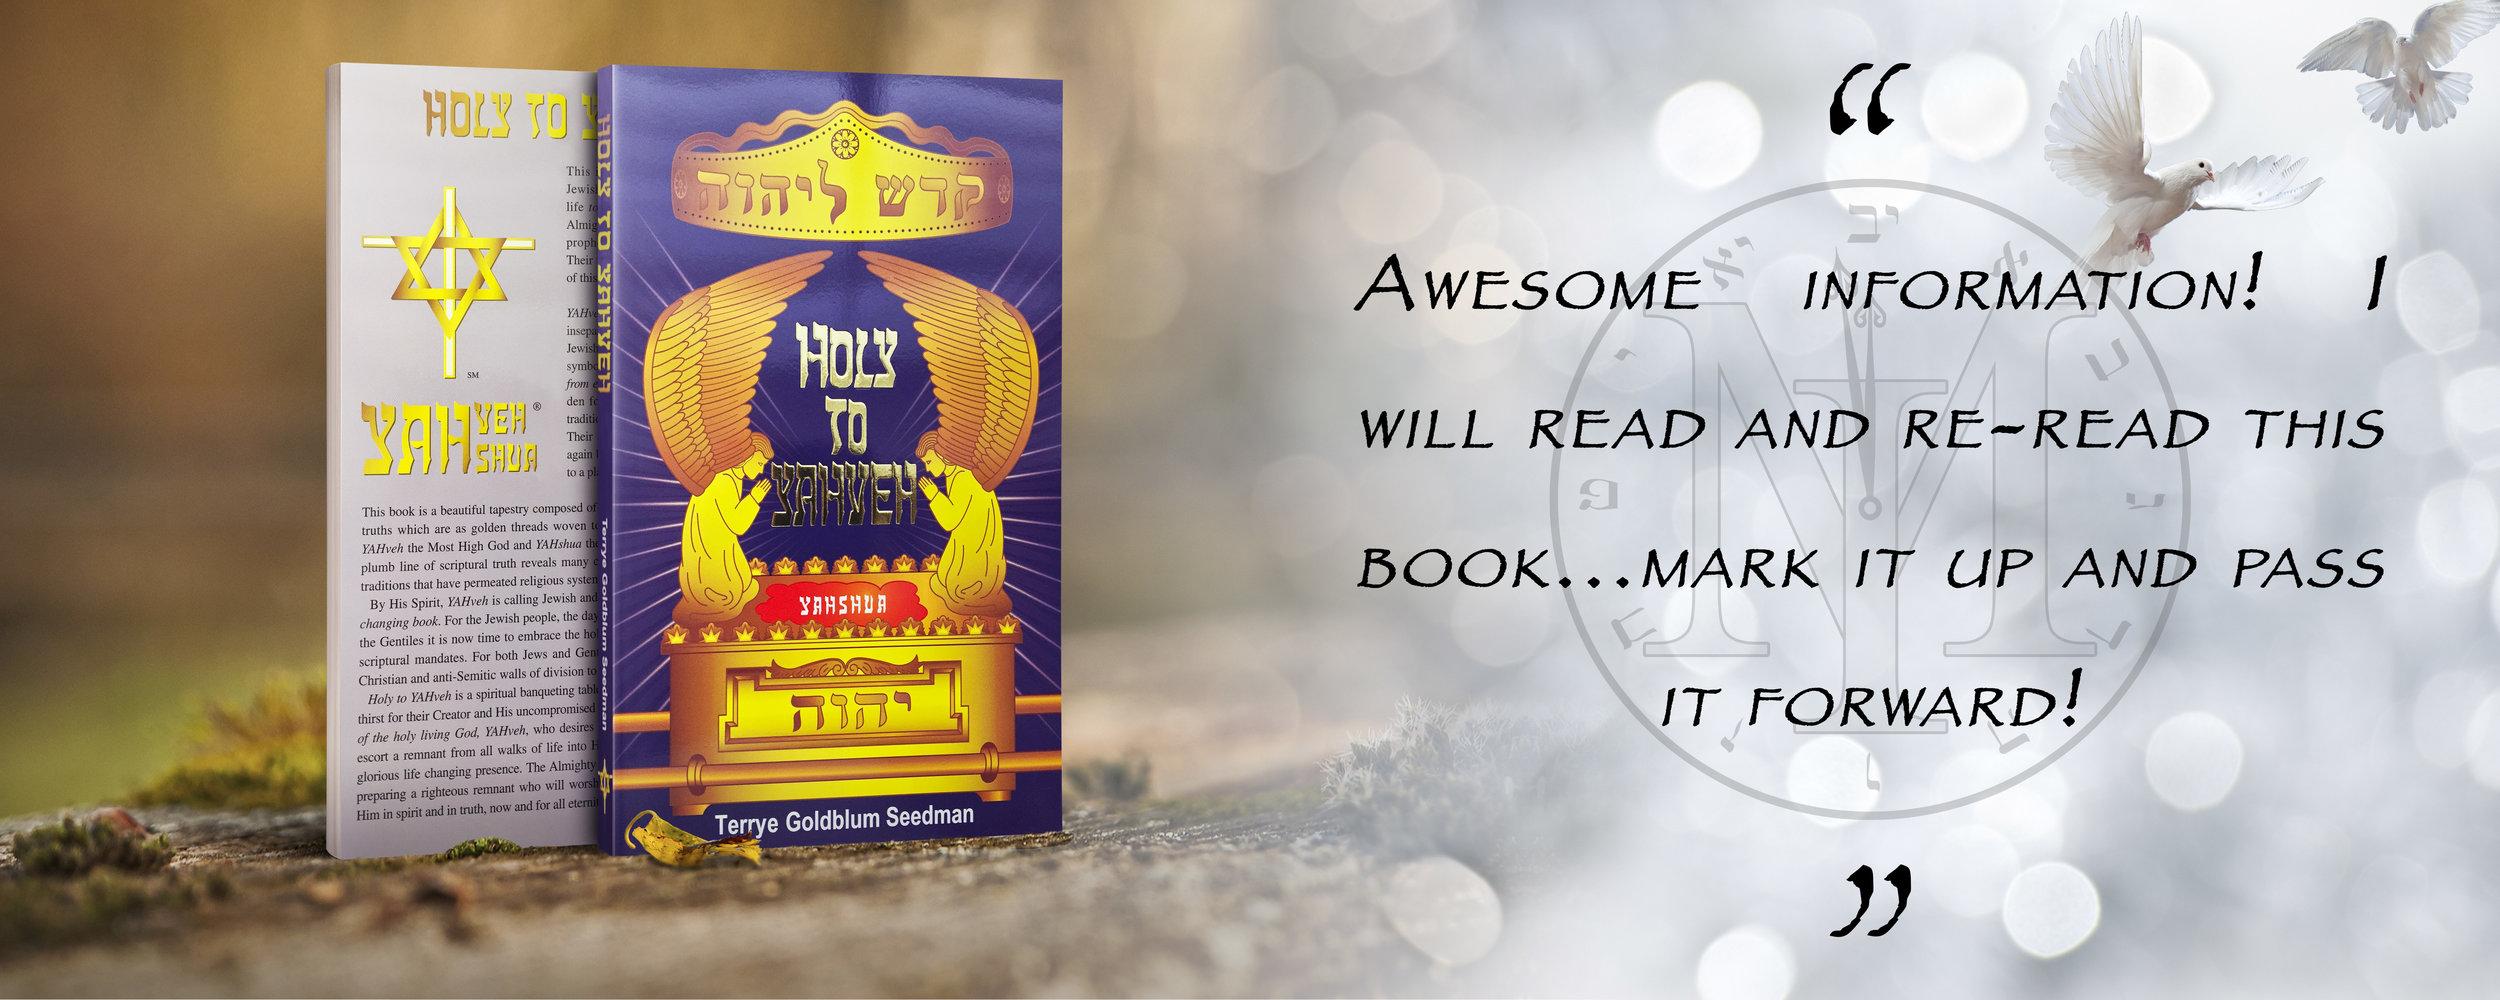 Testimonial 6 - Holy to Yahveh.jpg